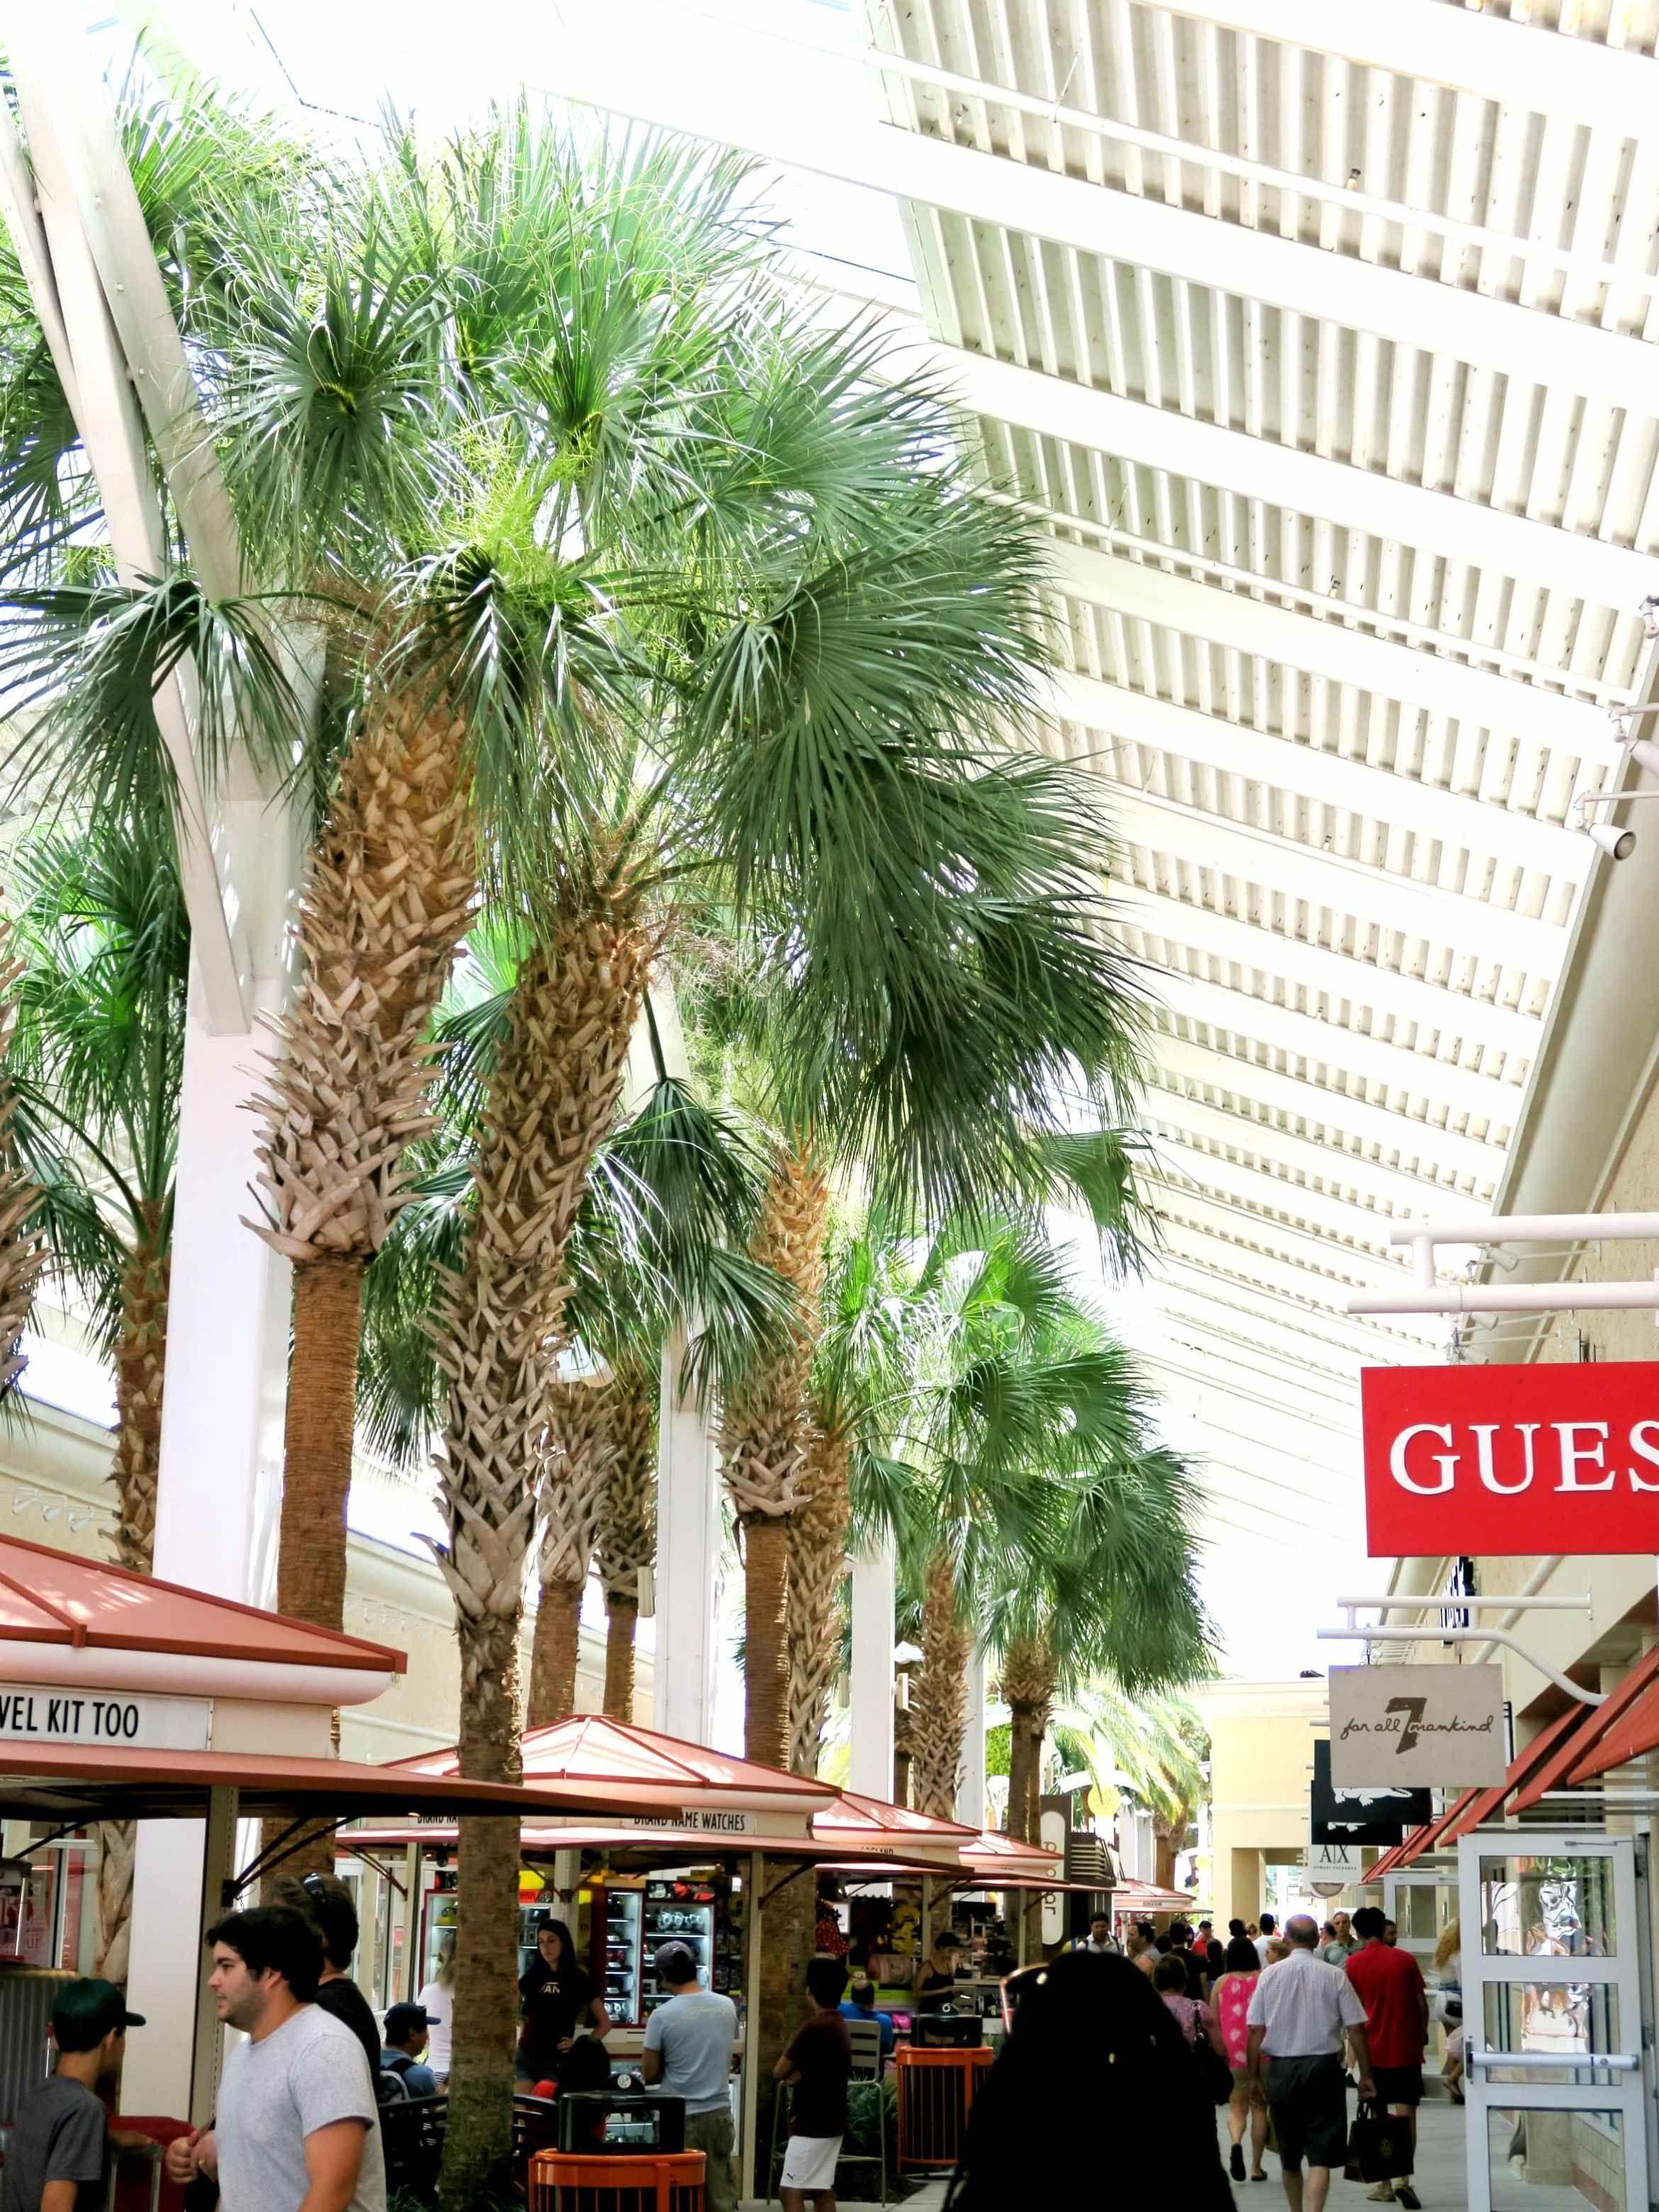 e66d04704cf0 A Day Shopping At Orlando Vineland Premium Outlets